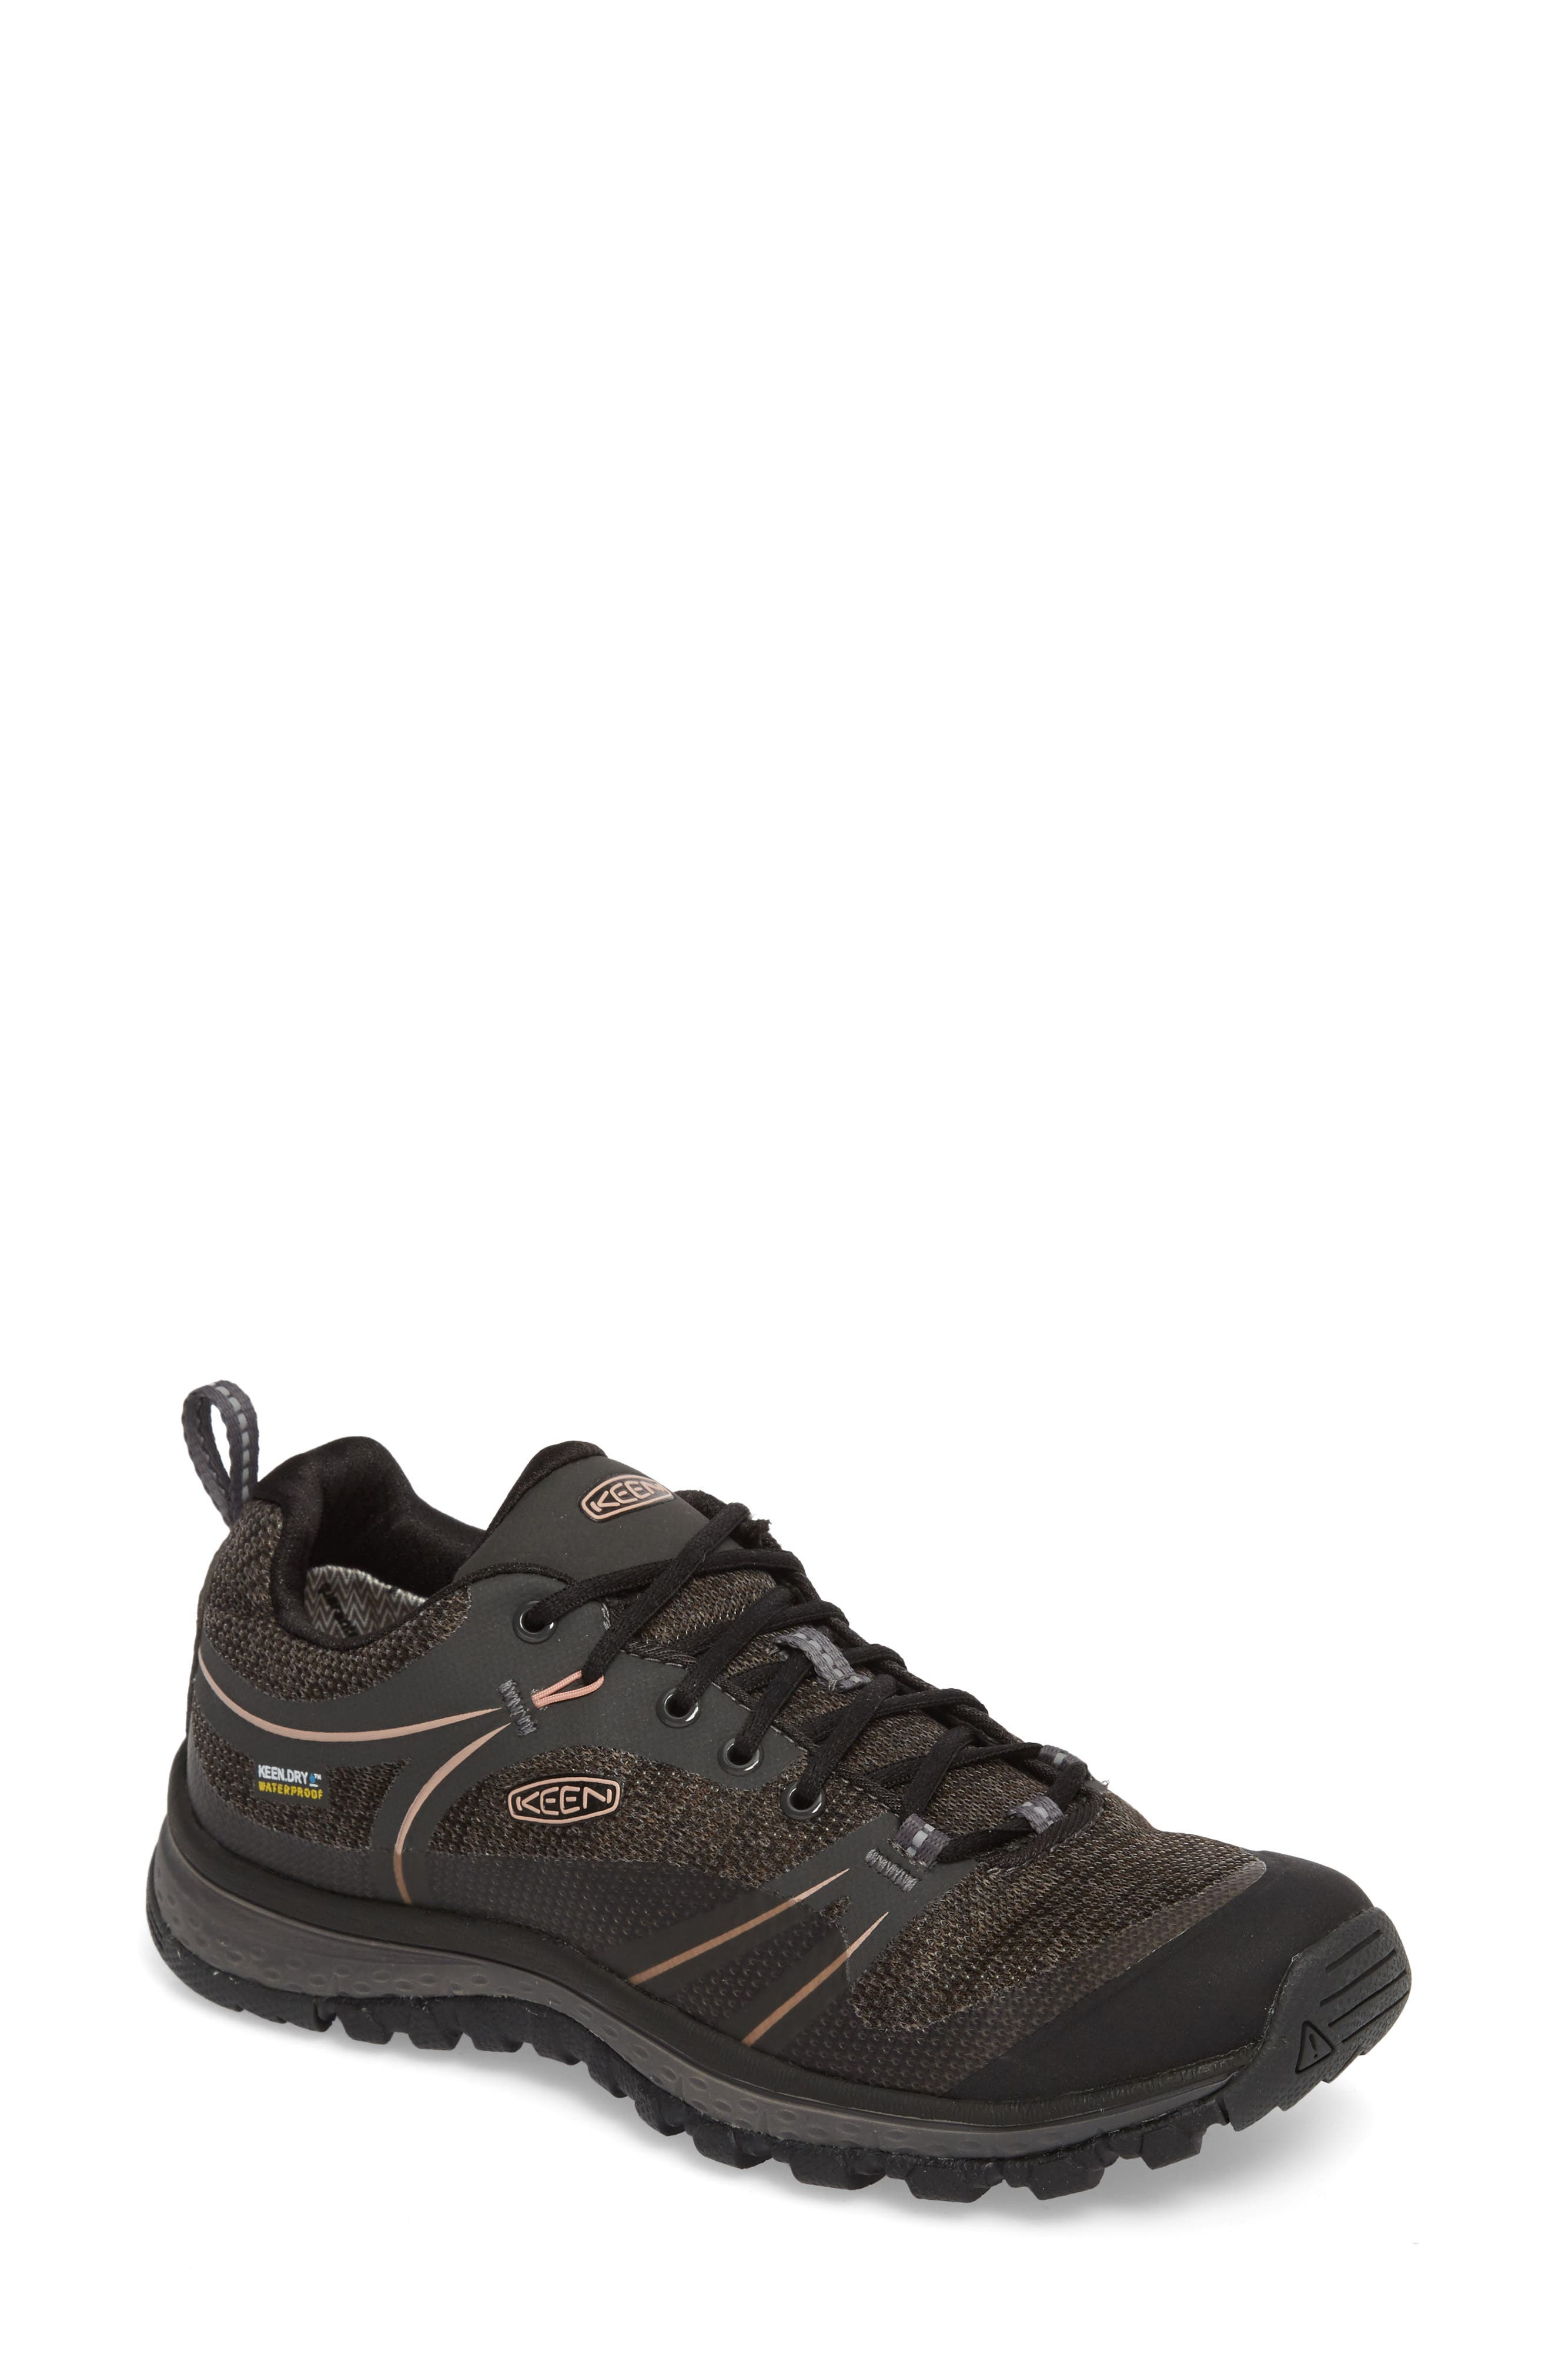 Terradora Waterproof Hiking Shoe,                             Main thumbnail 1, color,                             RAVEN/ ROSE DAWN